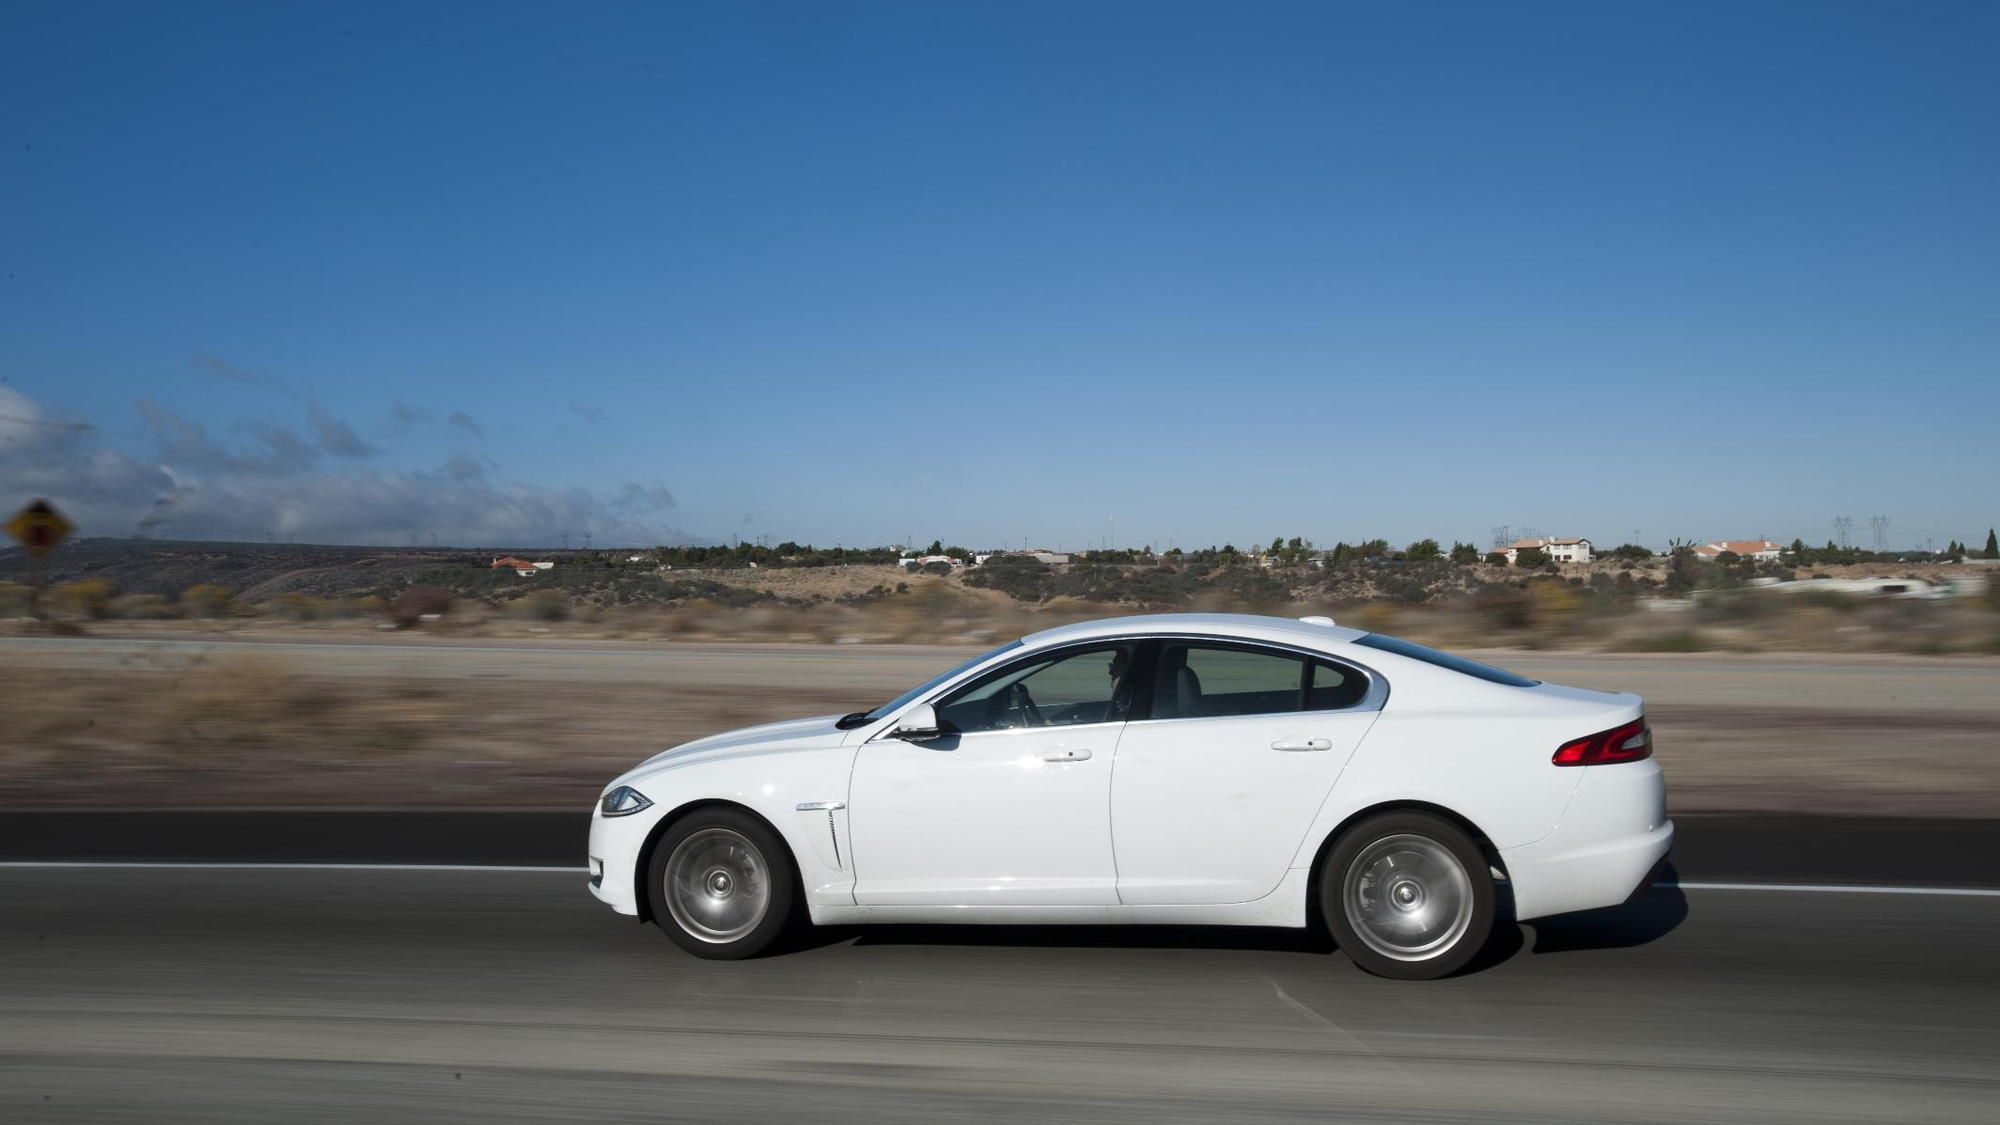 Jaguar XF 2.2 Diesel, New York to L.A. tour